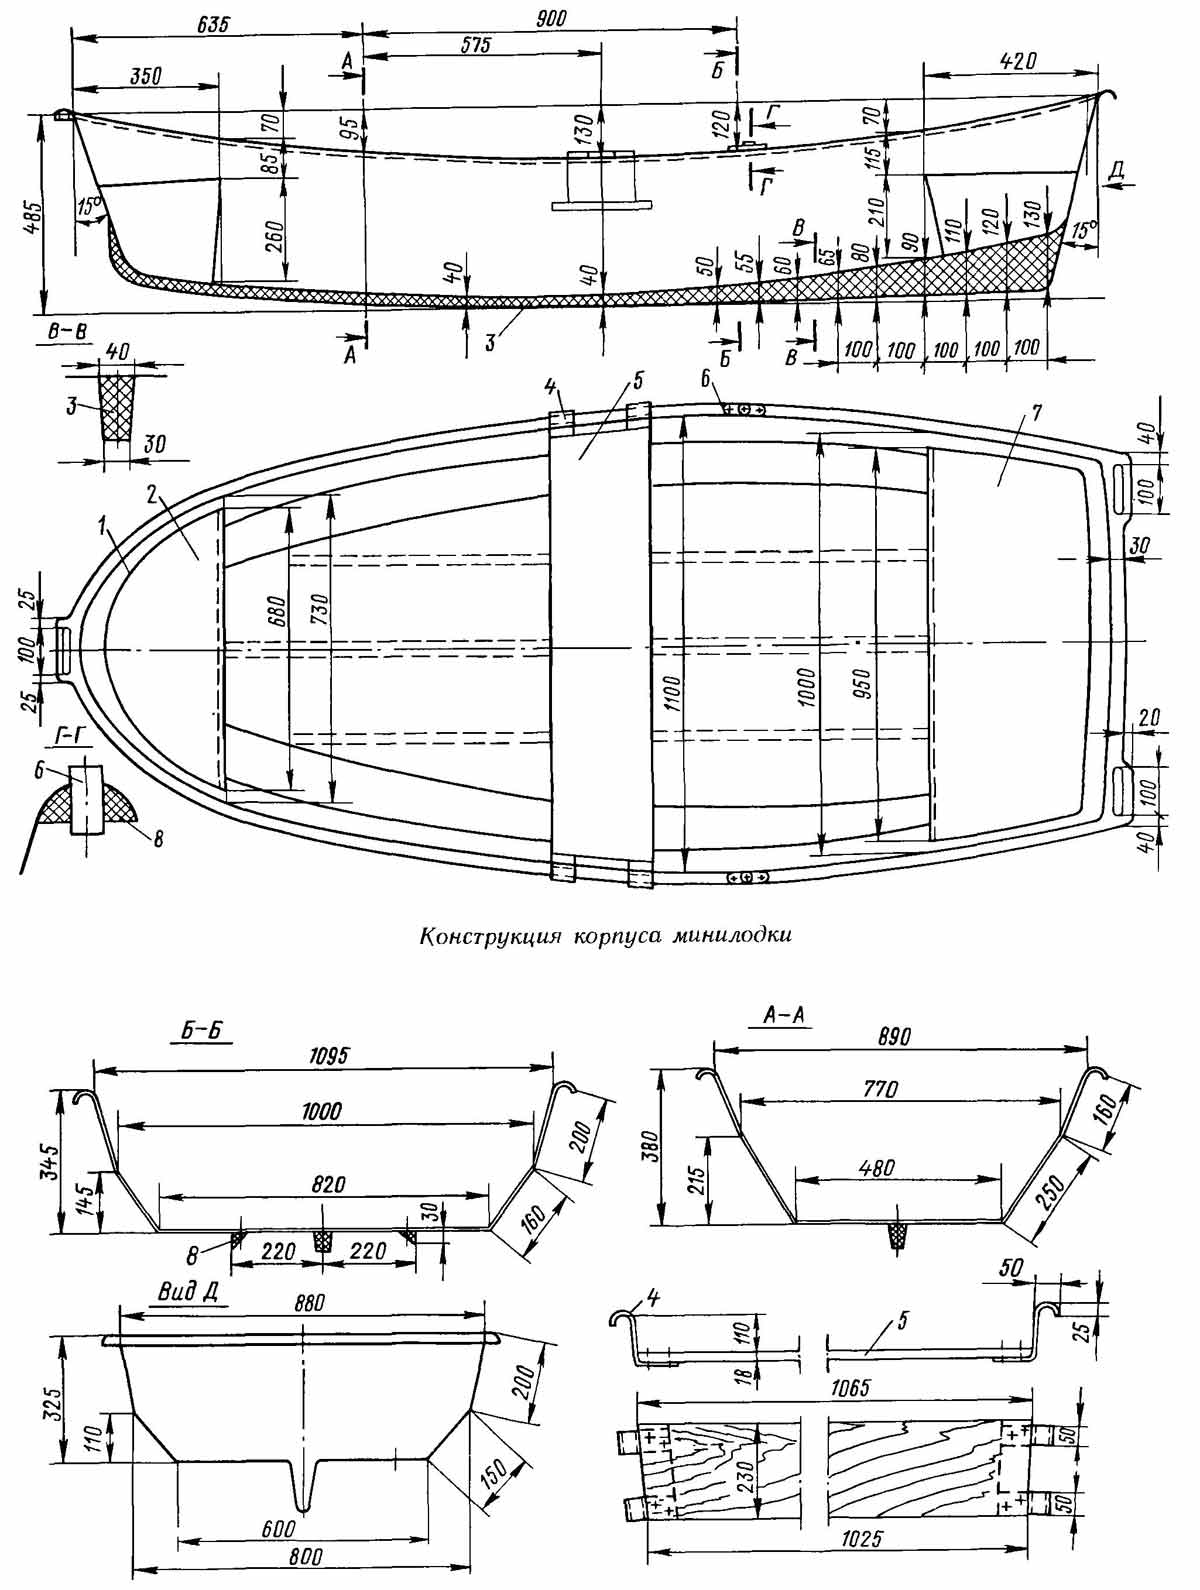 конструкции корпусов лодок